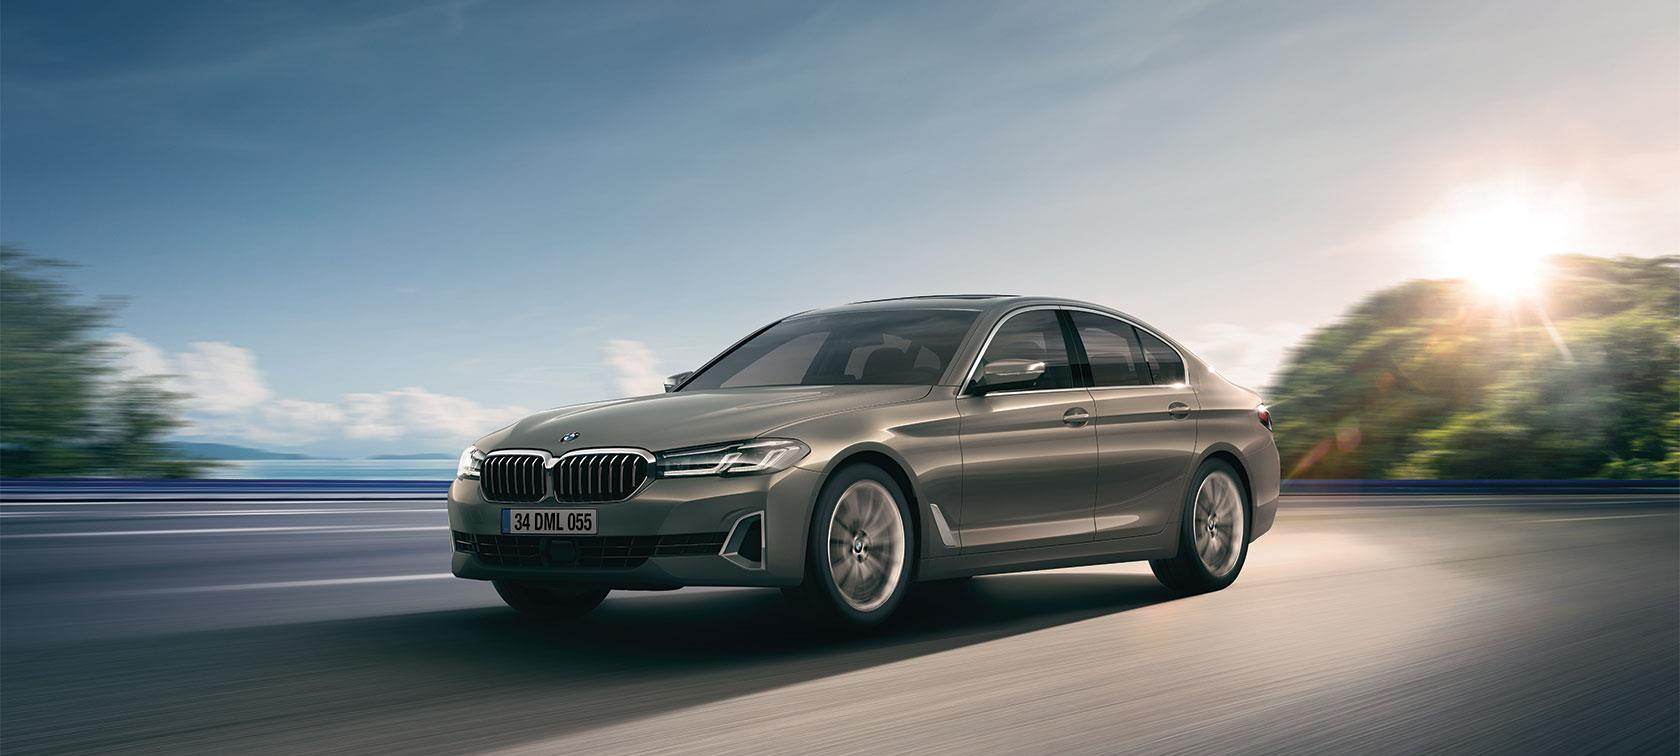 Yeni BMW 5 Serisi Sedan